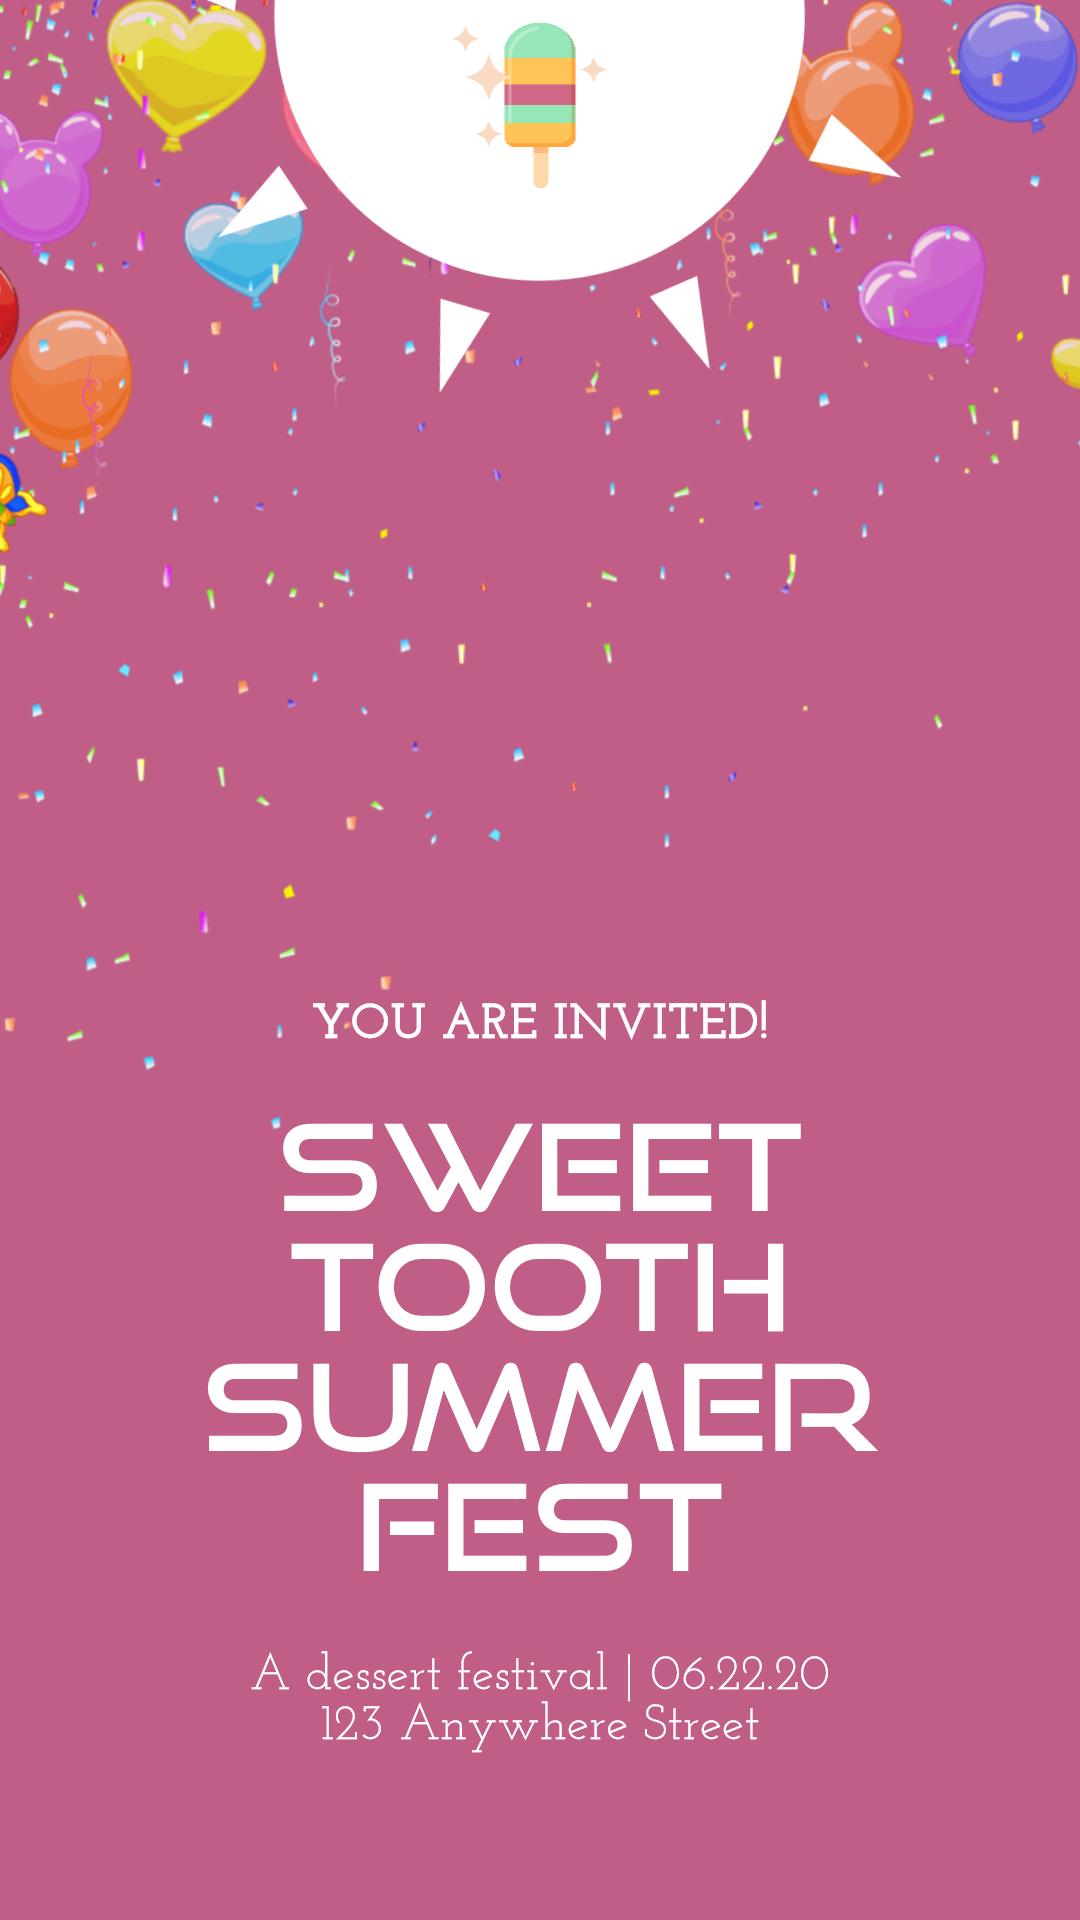 Custom Invitation Design - Popsicle Animation  Template